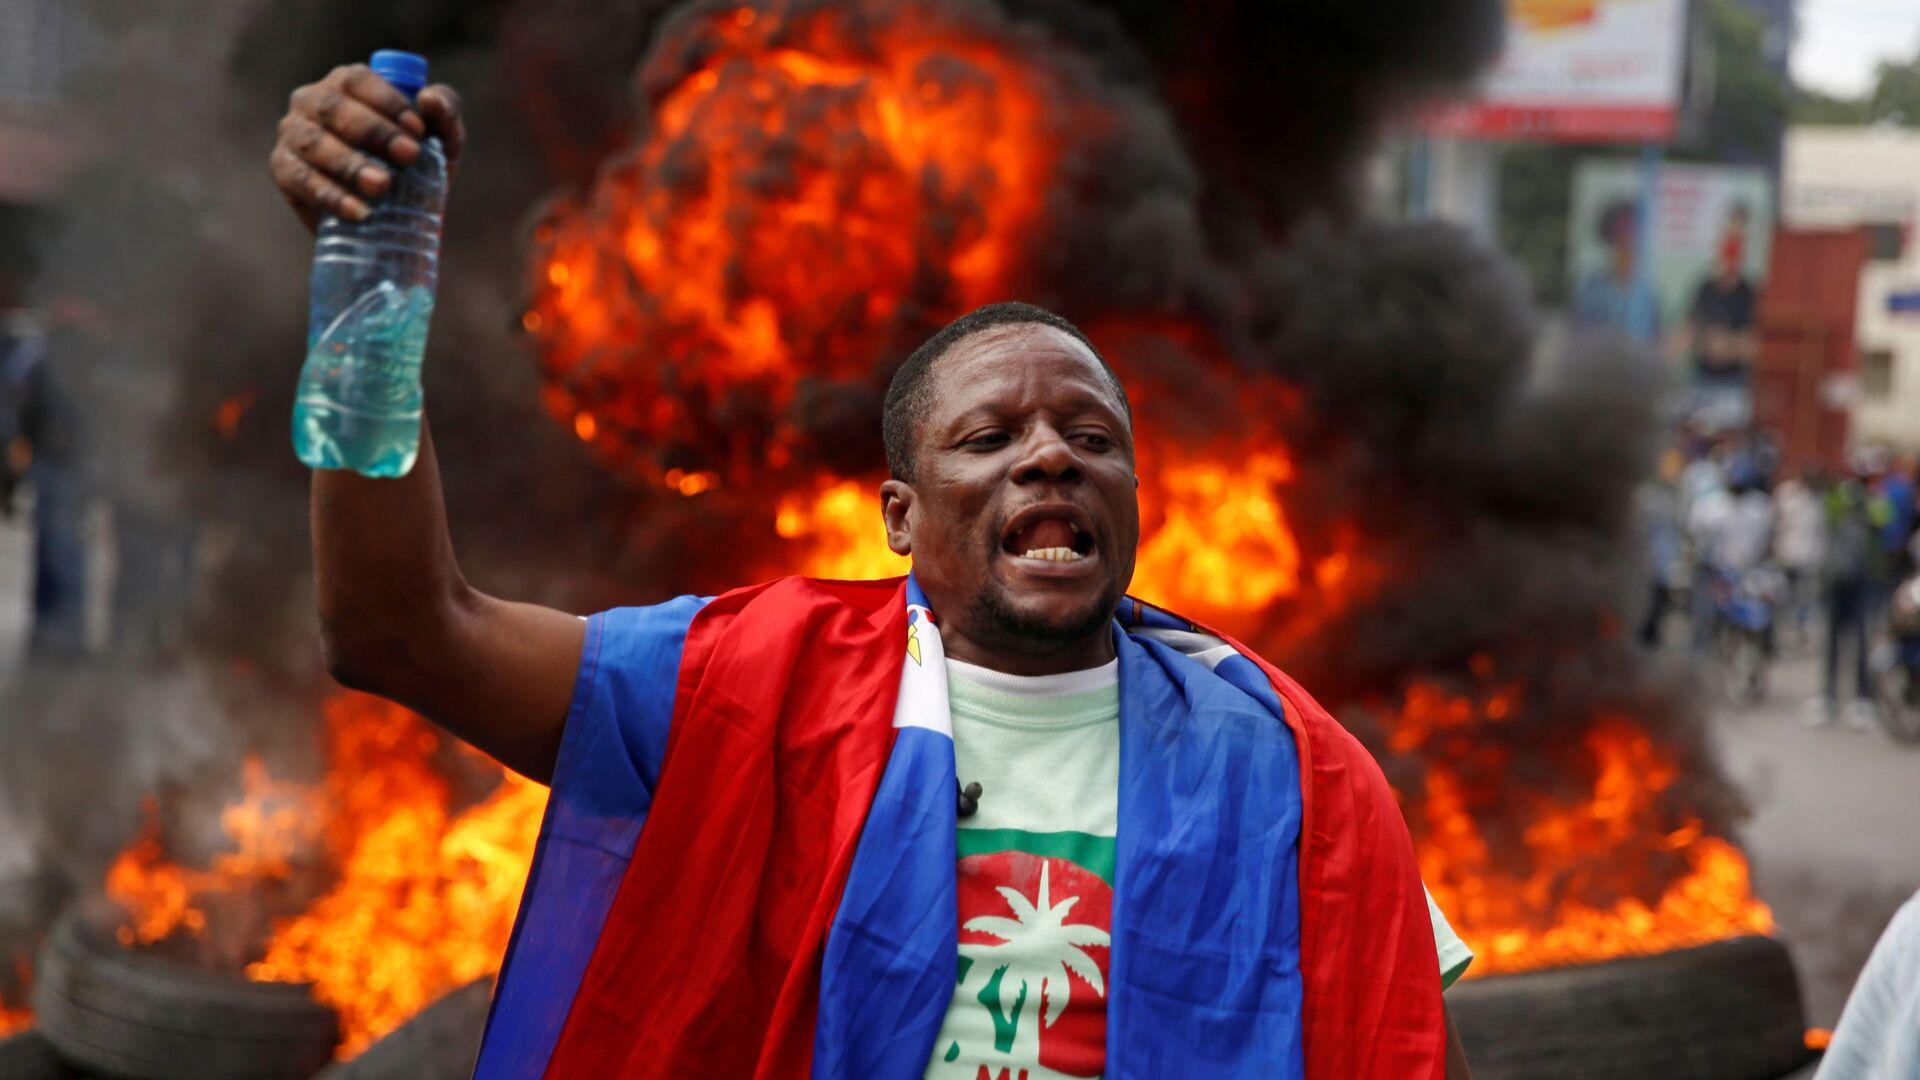 Un participante de protestas en Haití - Sputnik Mundo, 1920, 10.02.2021